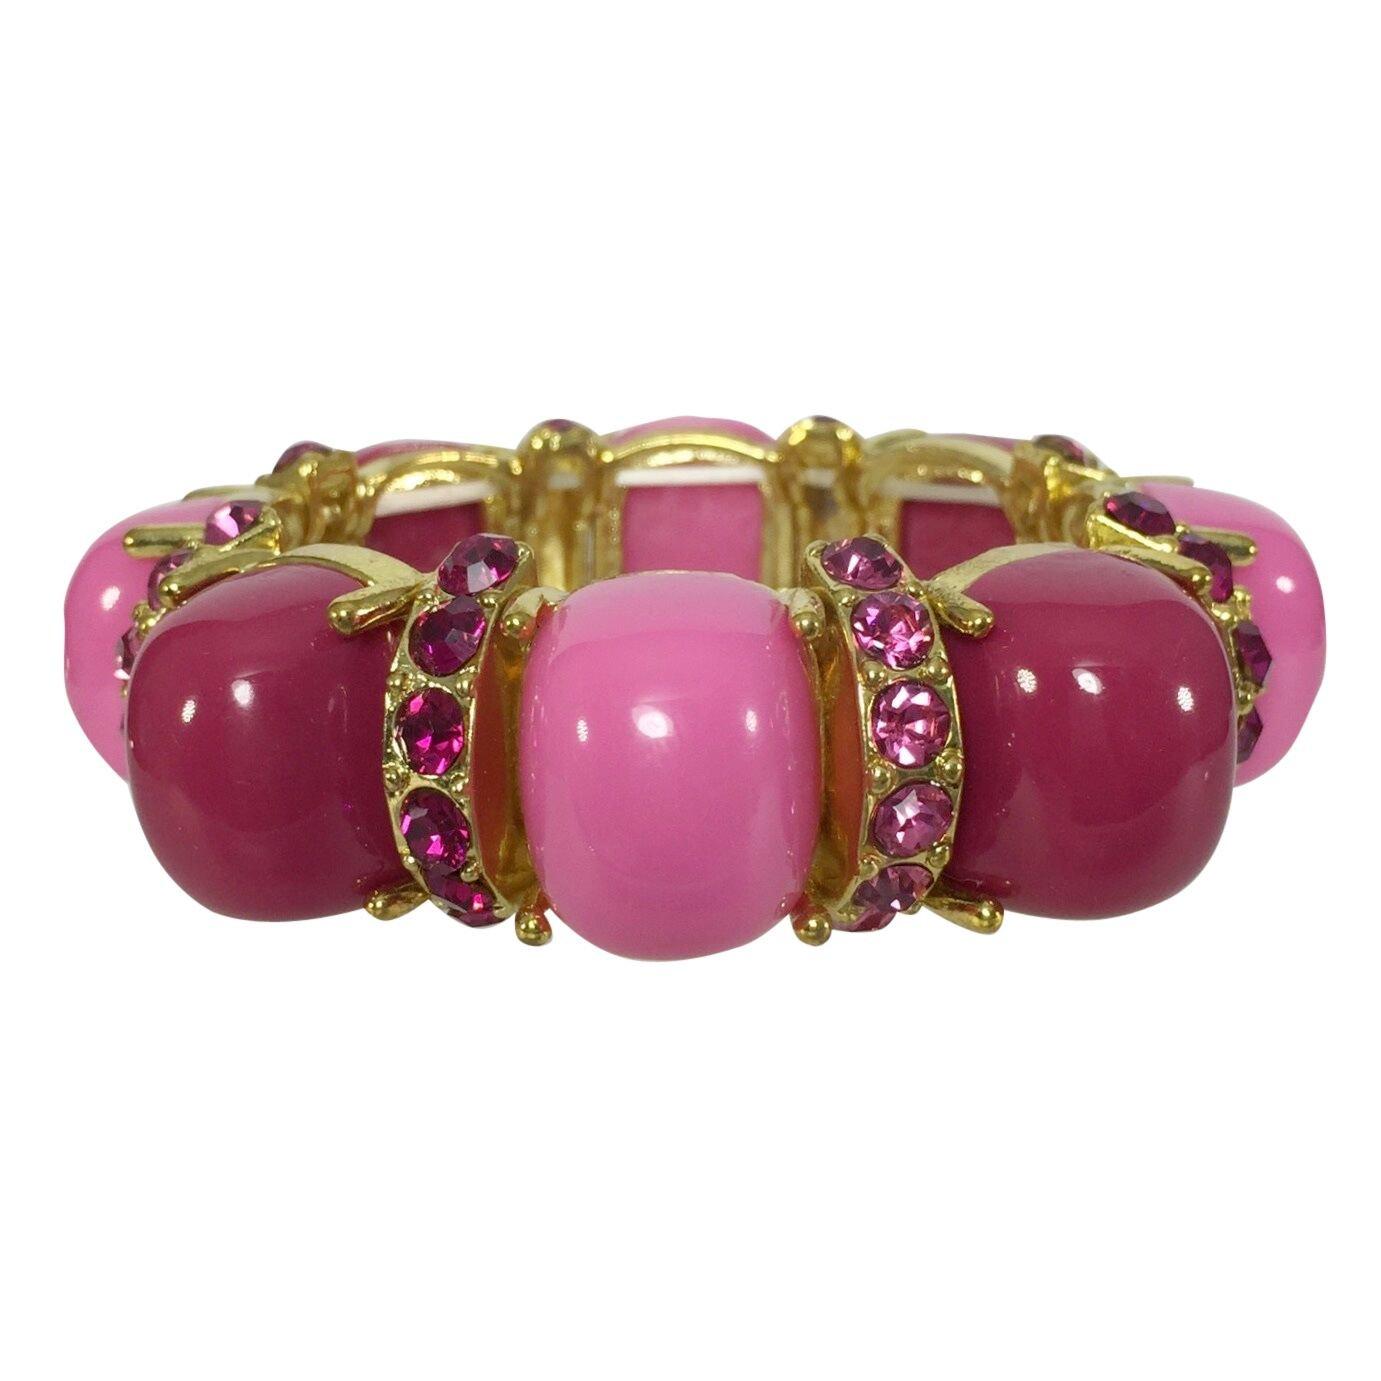 Gypsy Jewels Pink Tones Rhinestone Acrylic Bubble Gold Tone Fun Stretch Bracelet